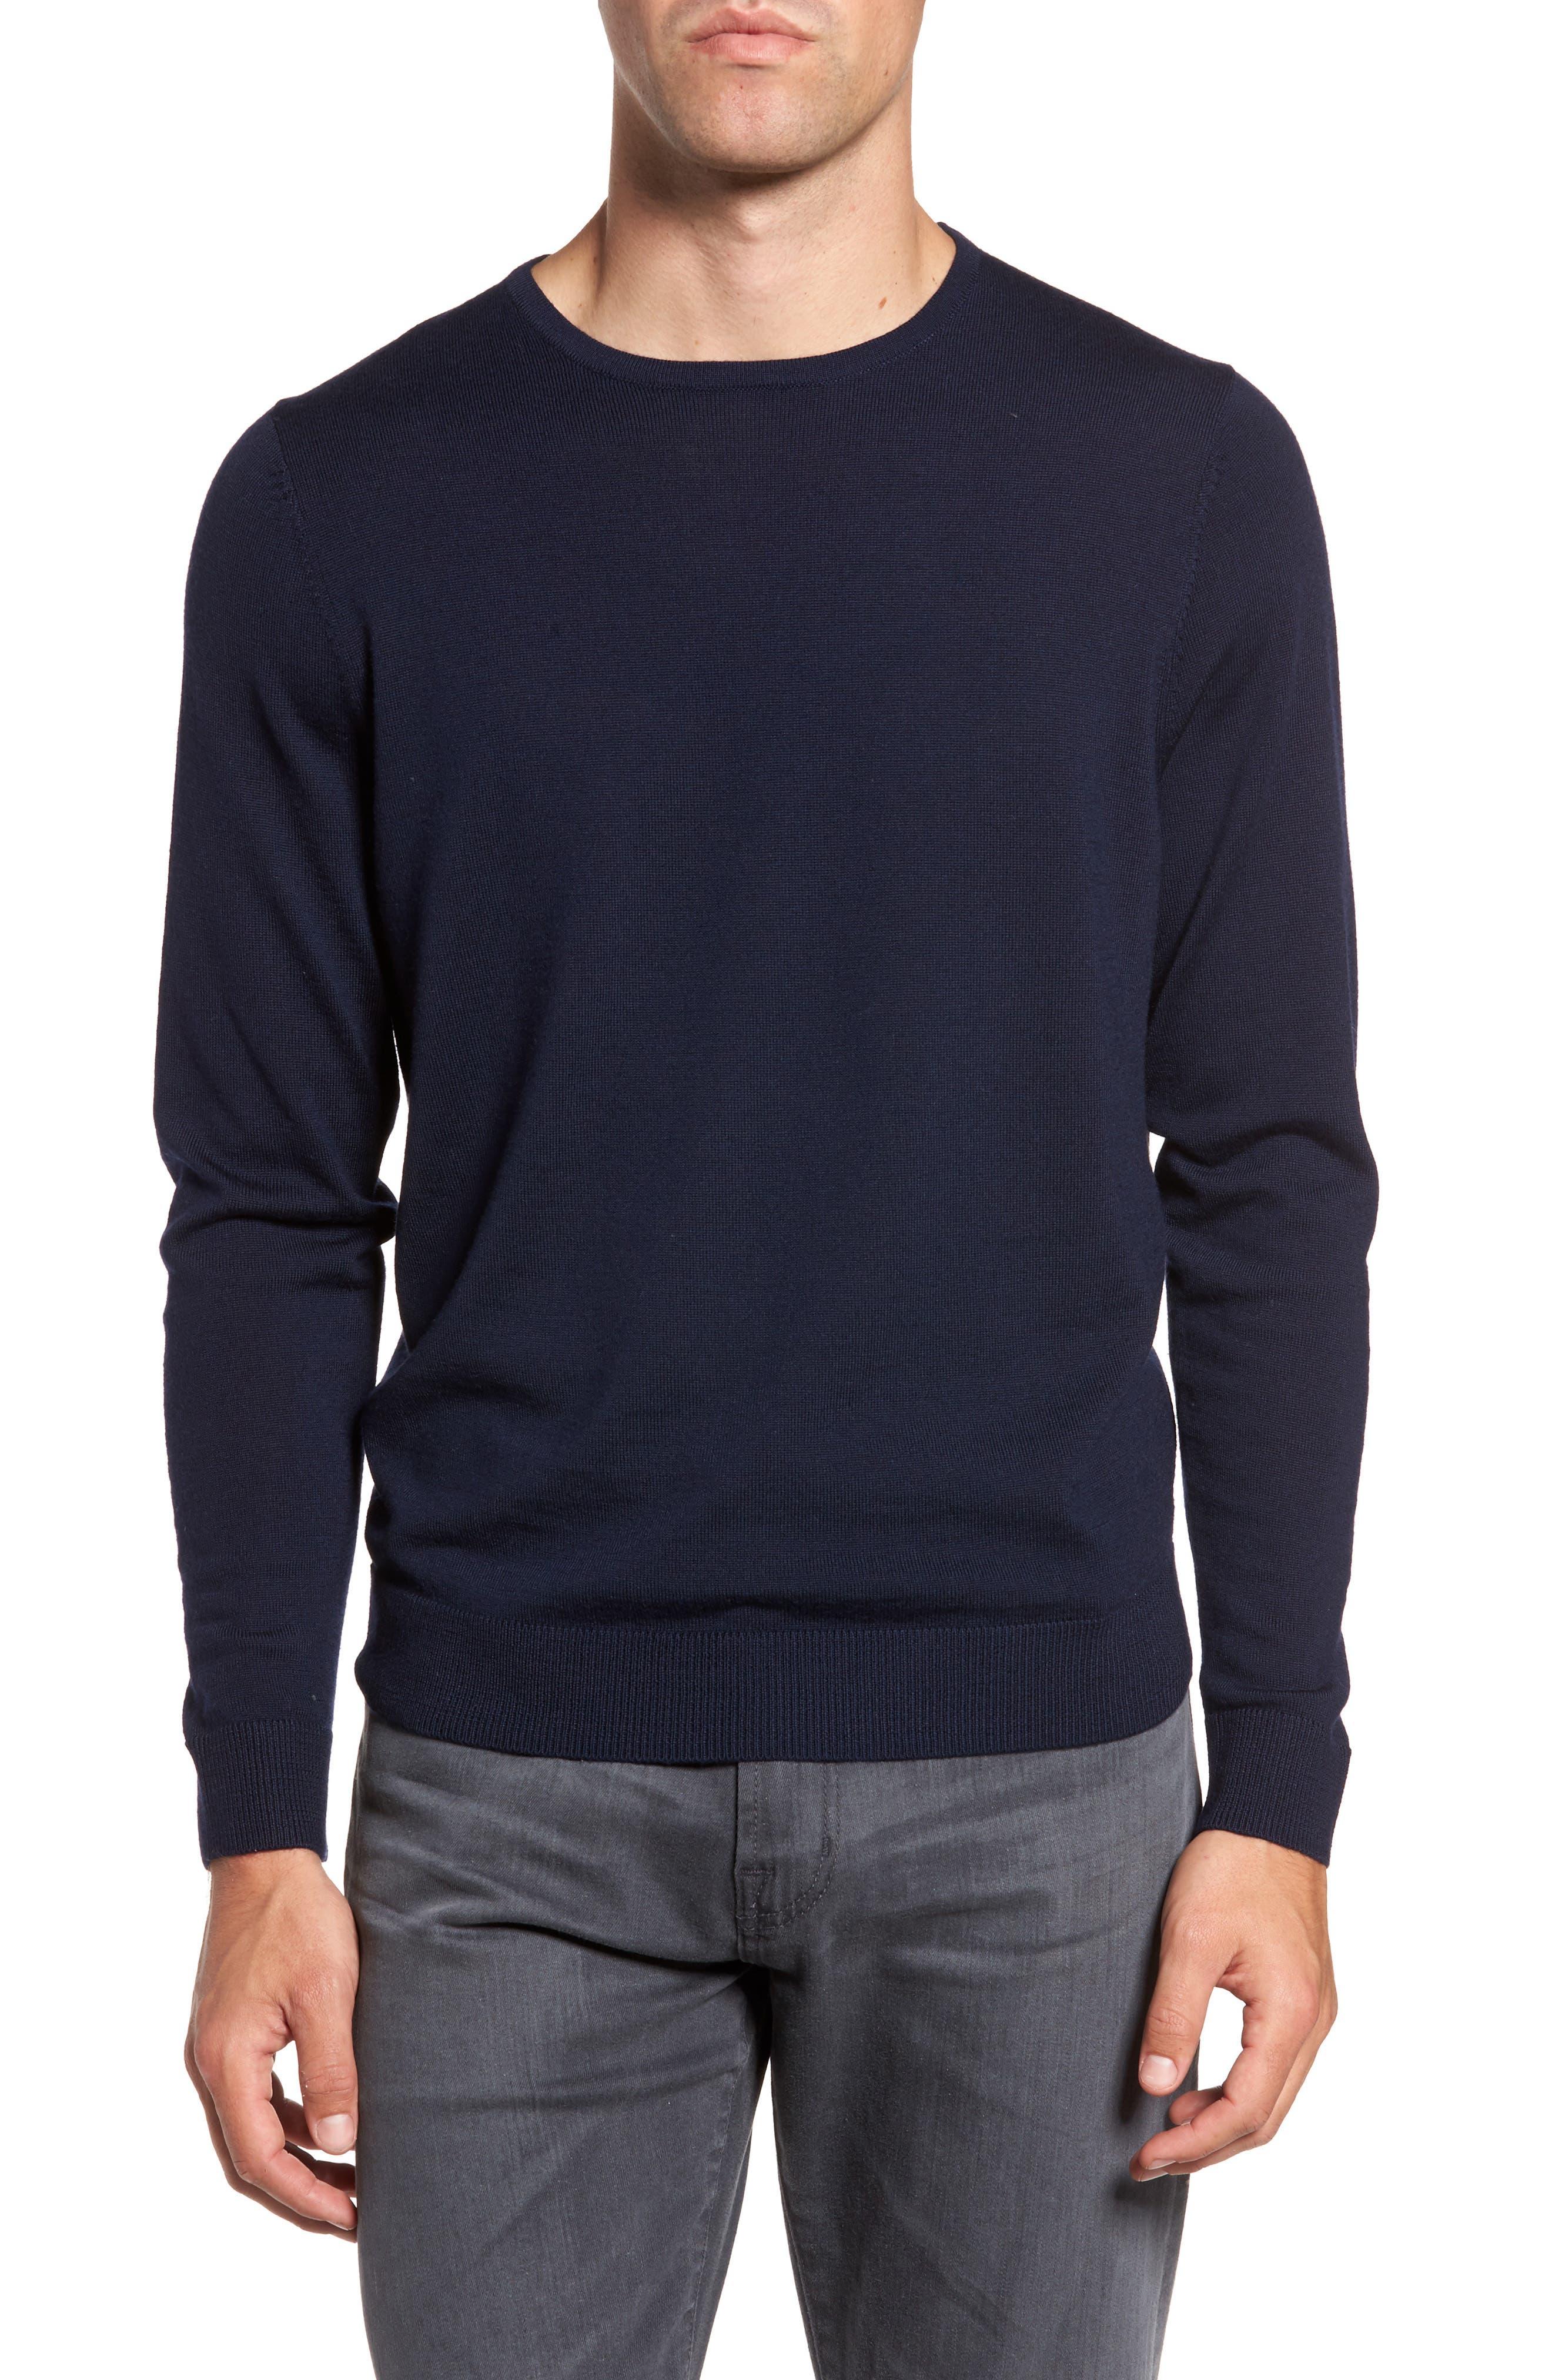 Nordstrom Shop Crewneck Merino Wool Sweater